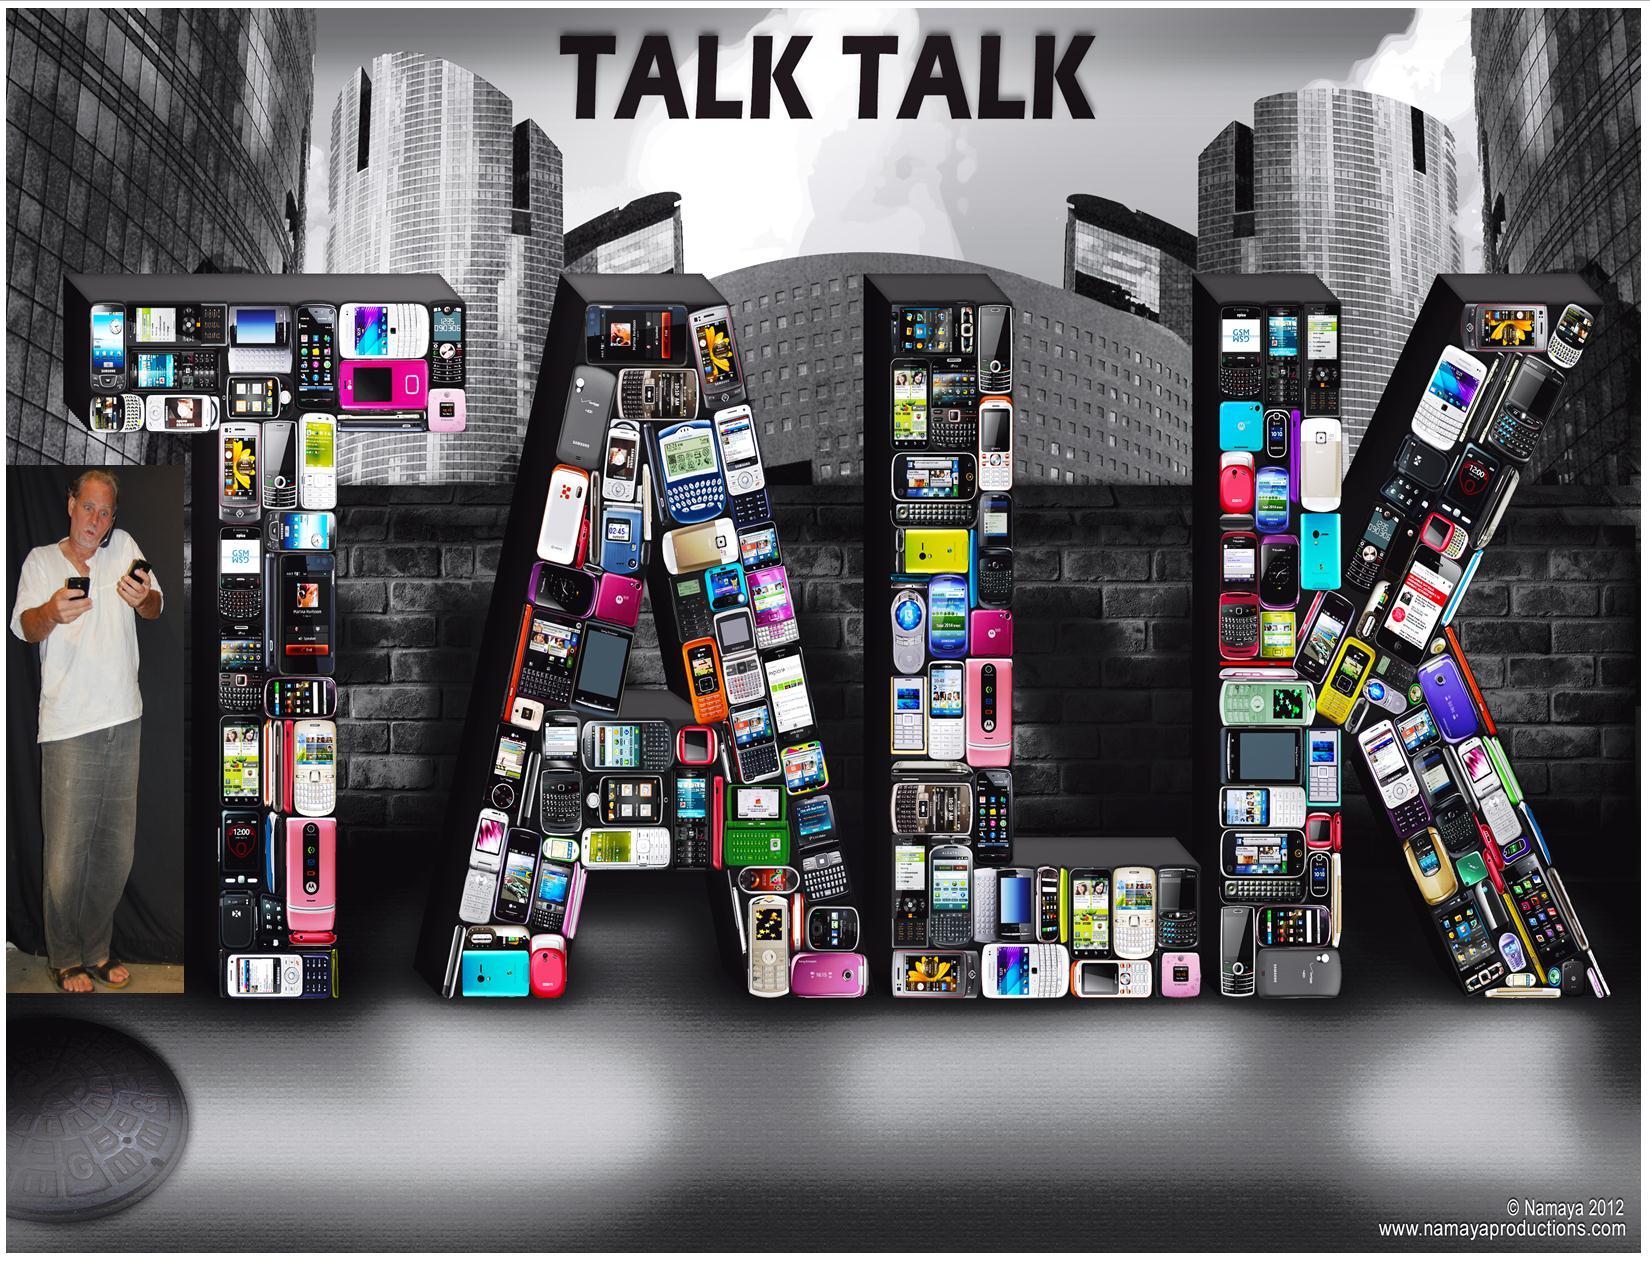 Talk Talk with namaya